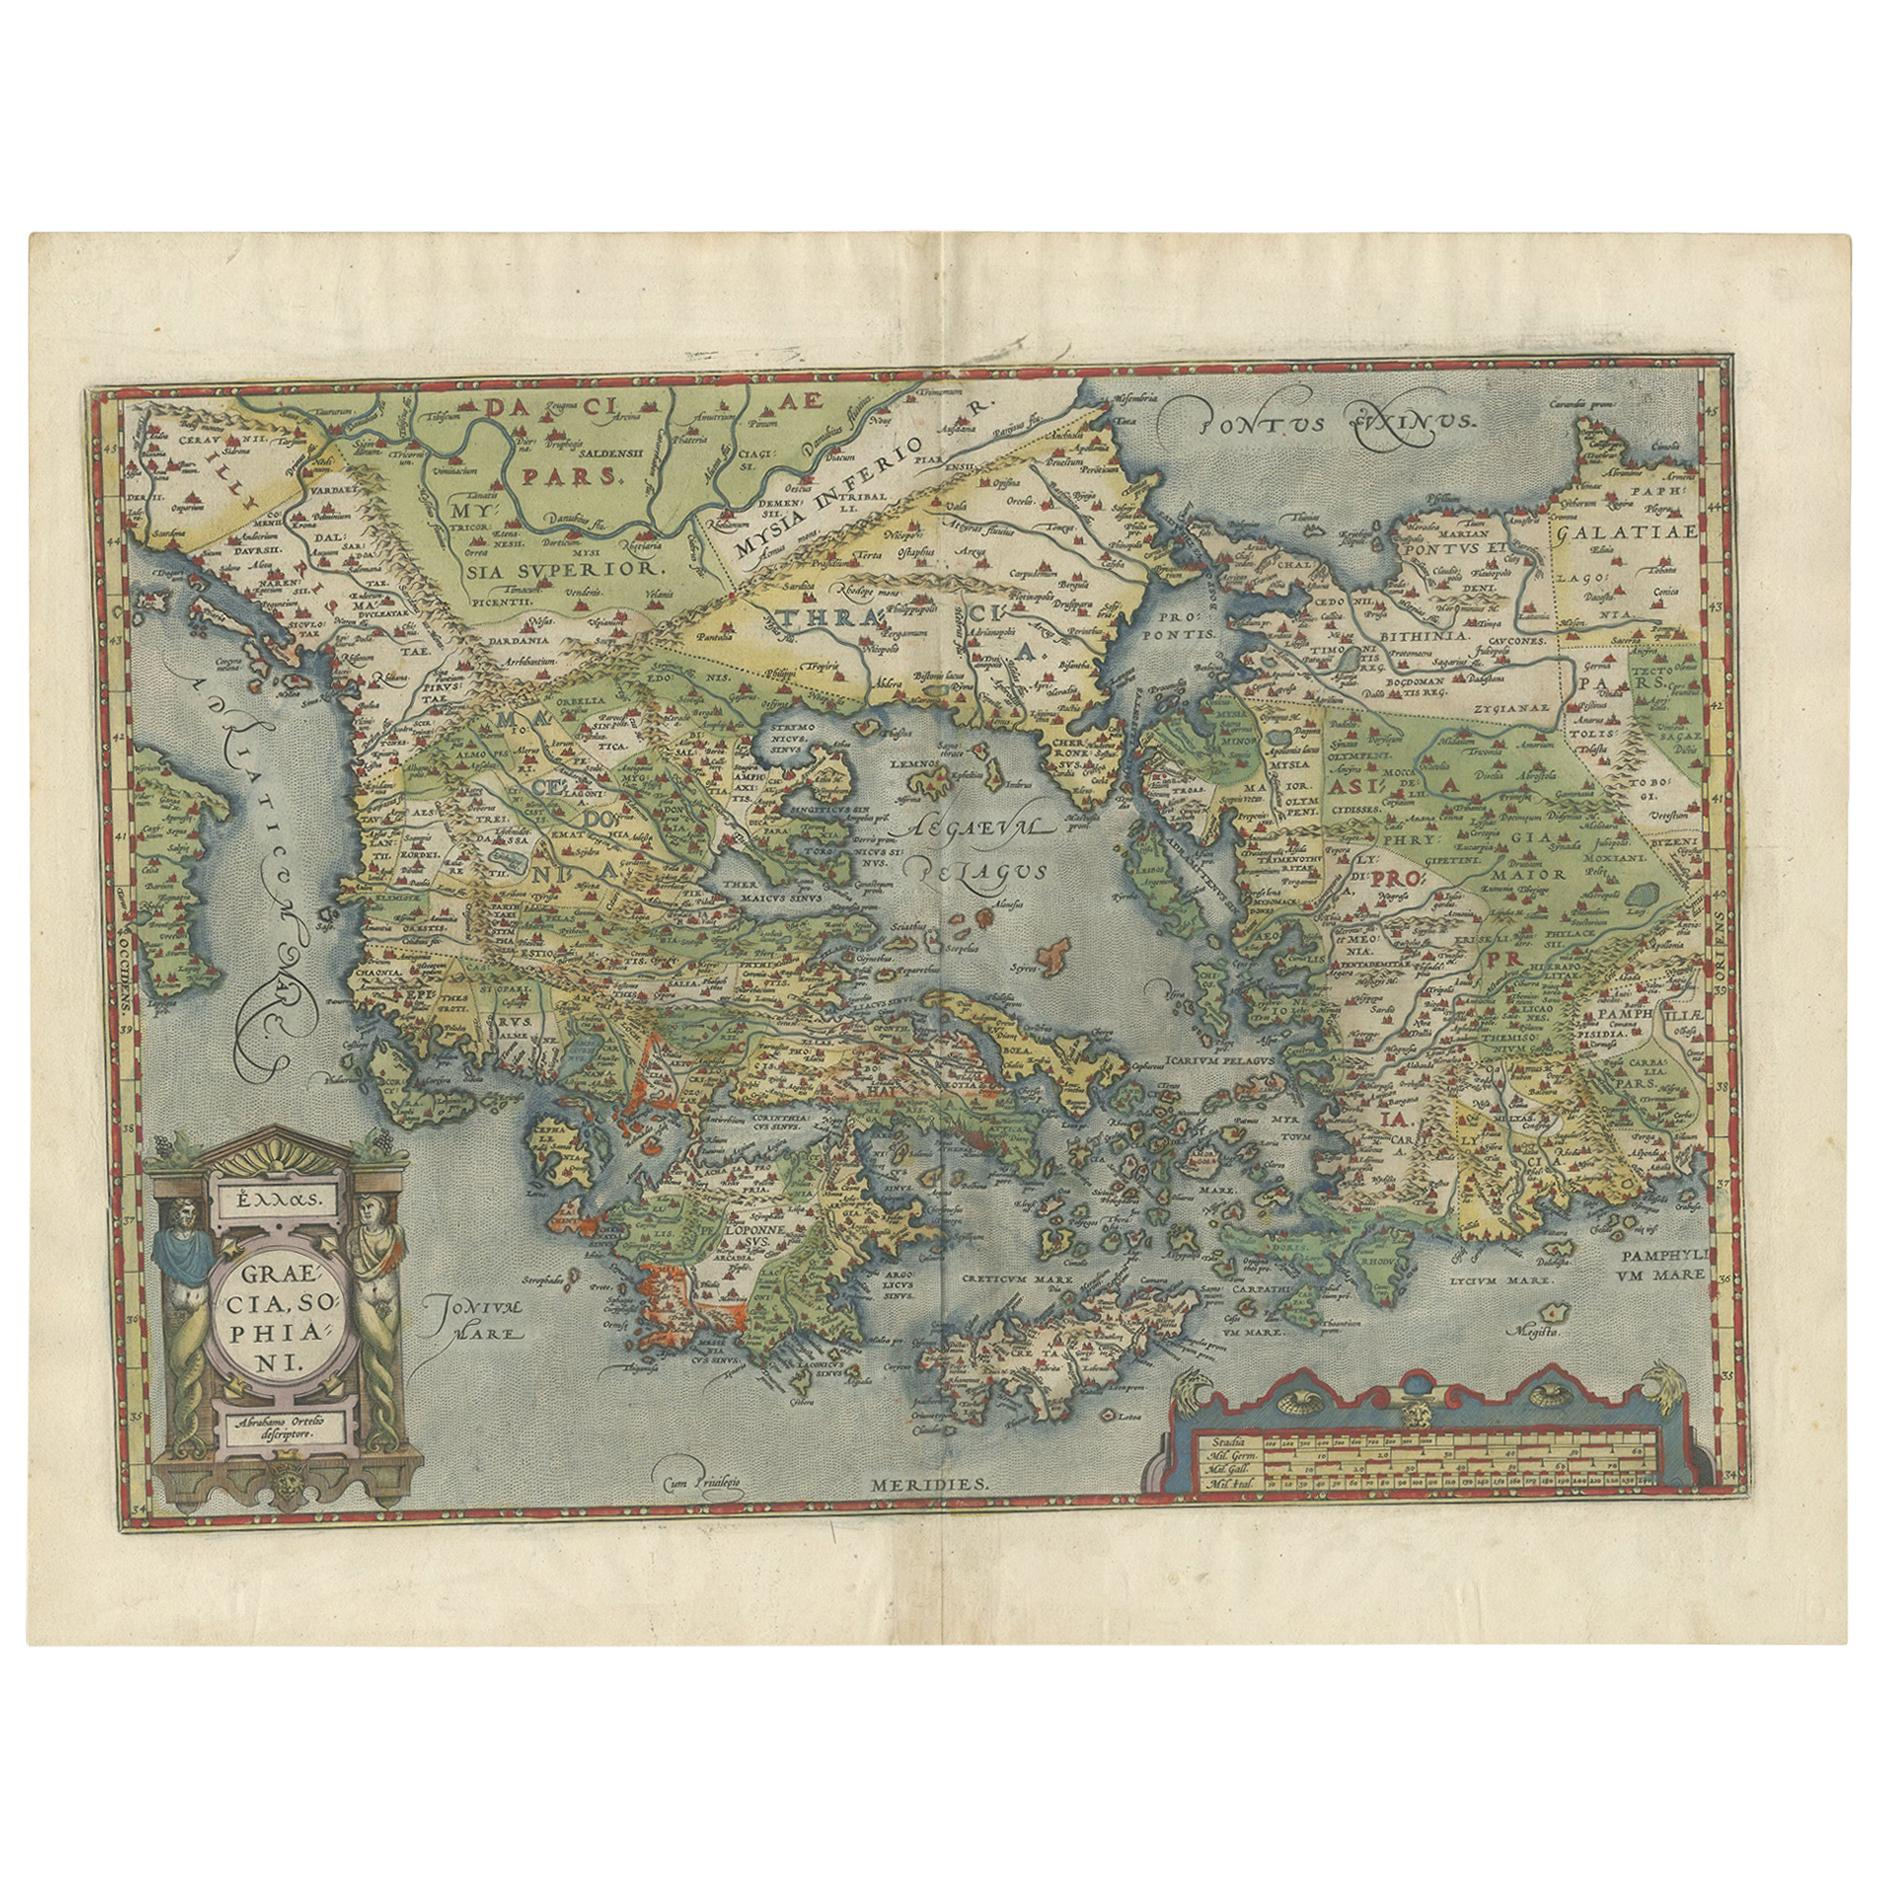 Antique Map of Greece by Ortelius, circa 1579